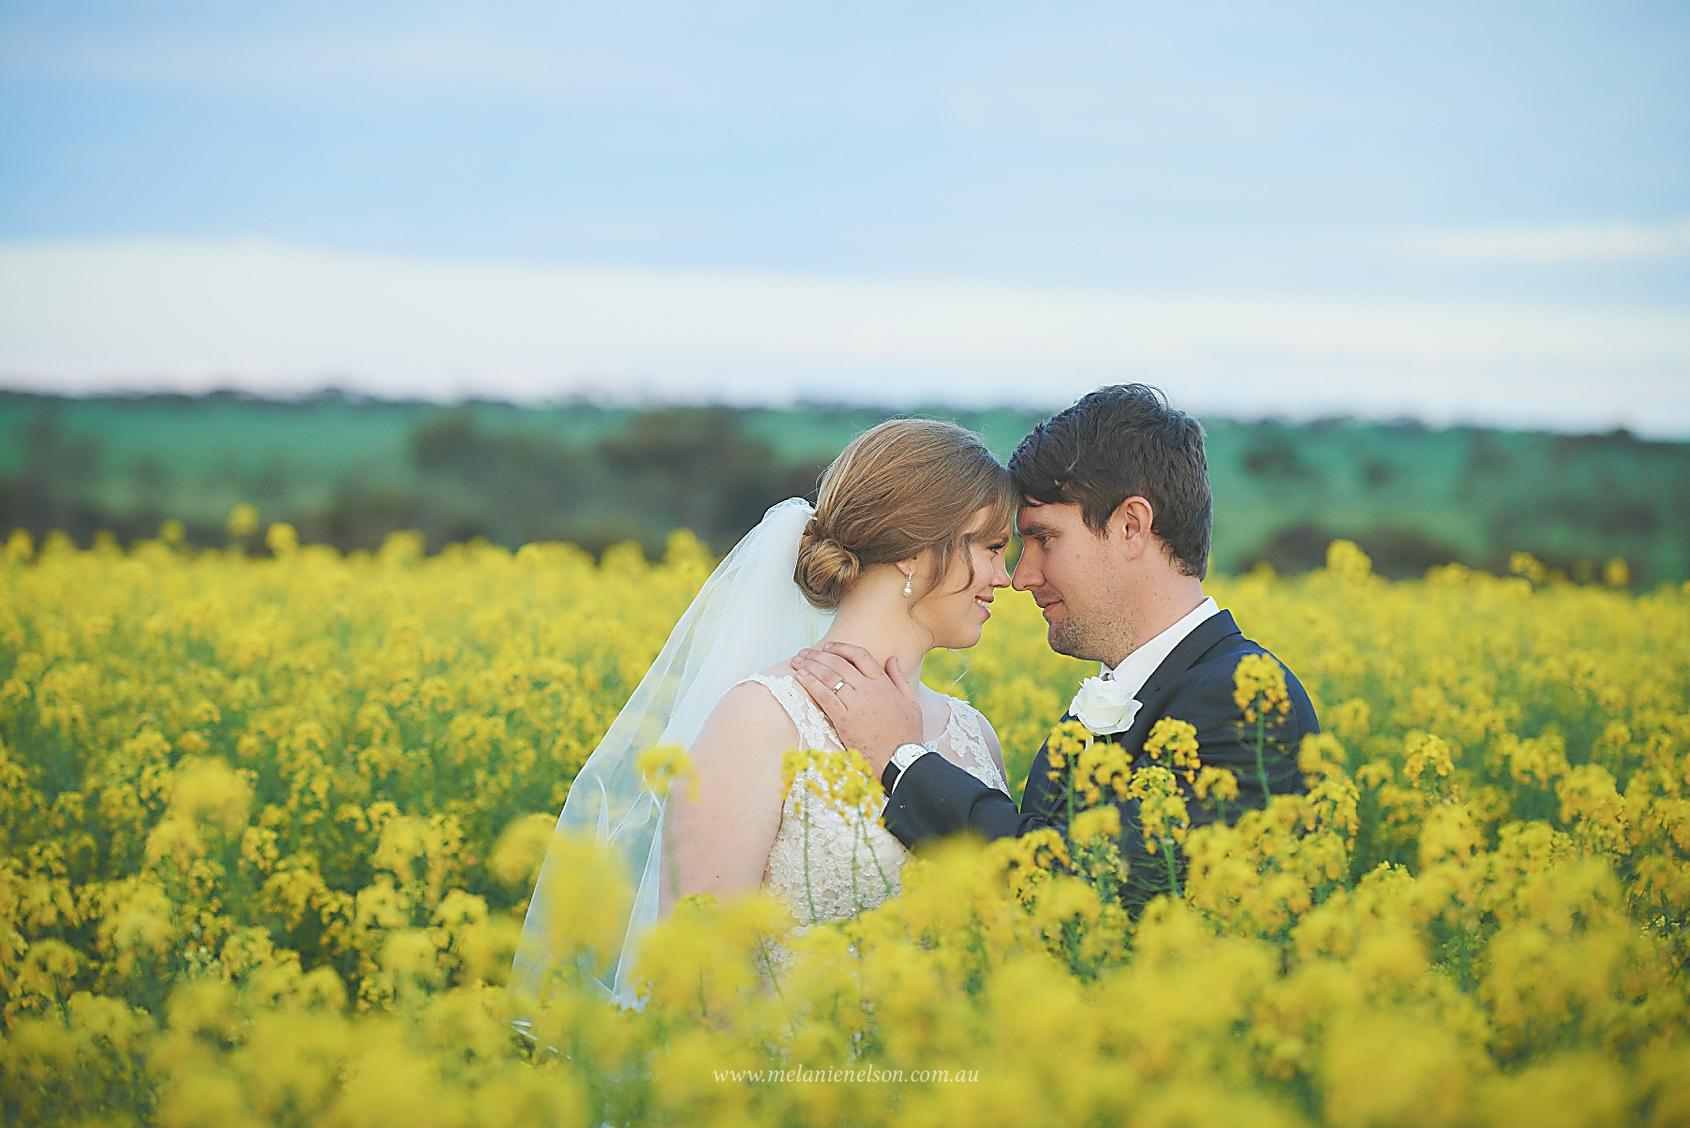 yorke_peninsula_wedding_photographer_0086.jpg